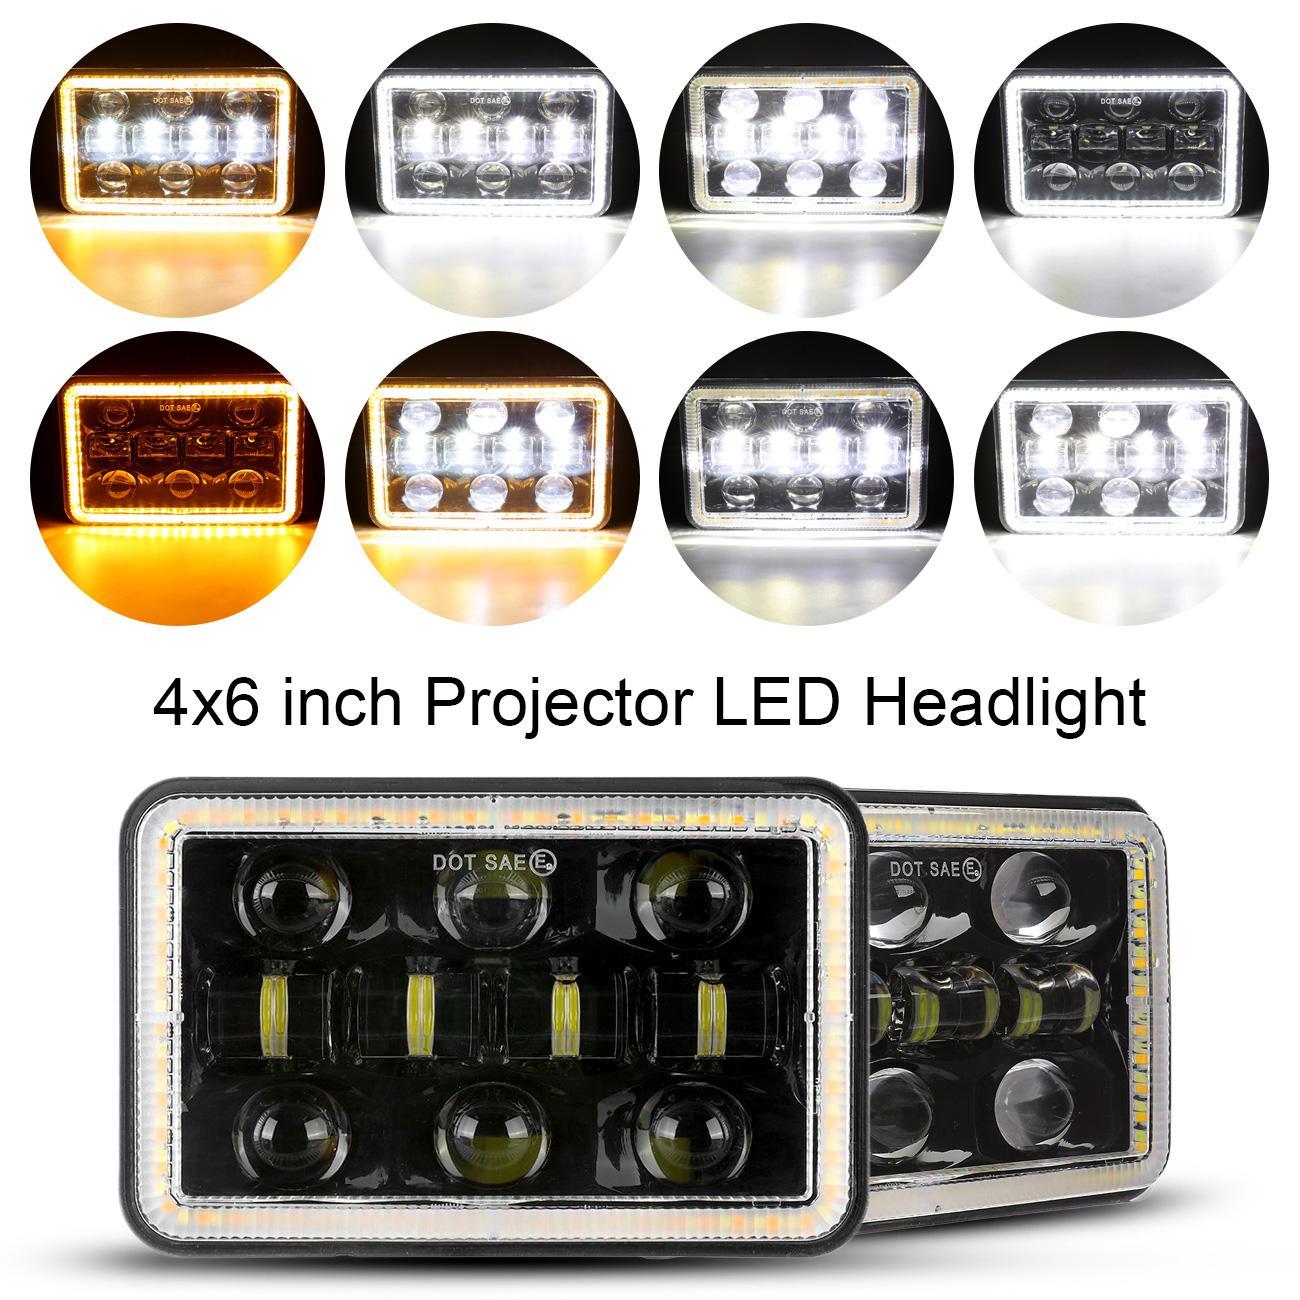 Faros delanteros LED de 4x6 pulgadas para coche, lámpara de señal de giro DRL de haz alto, resistente al agua para camión, remolque, barco, camión, caravana H4651 H4652